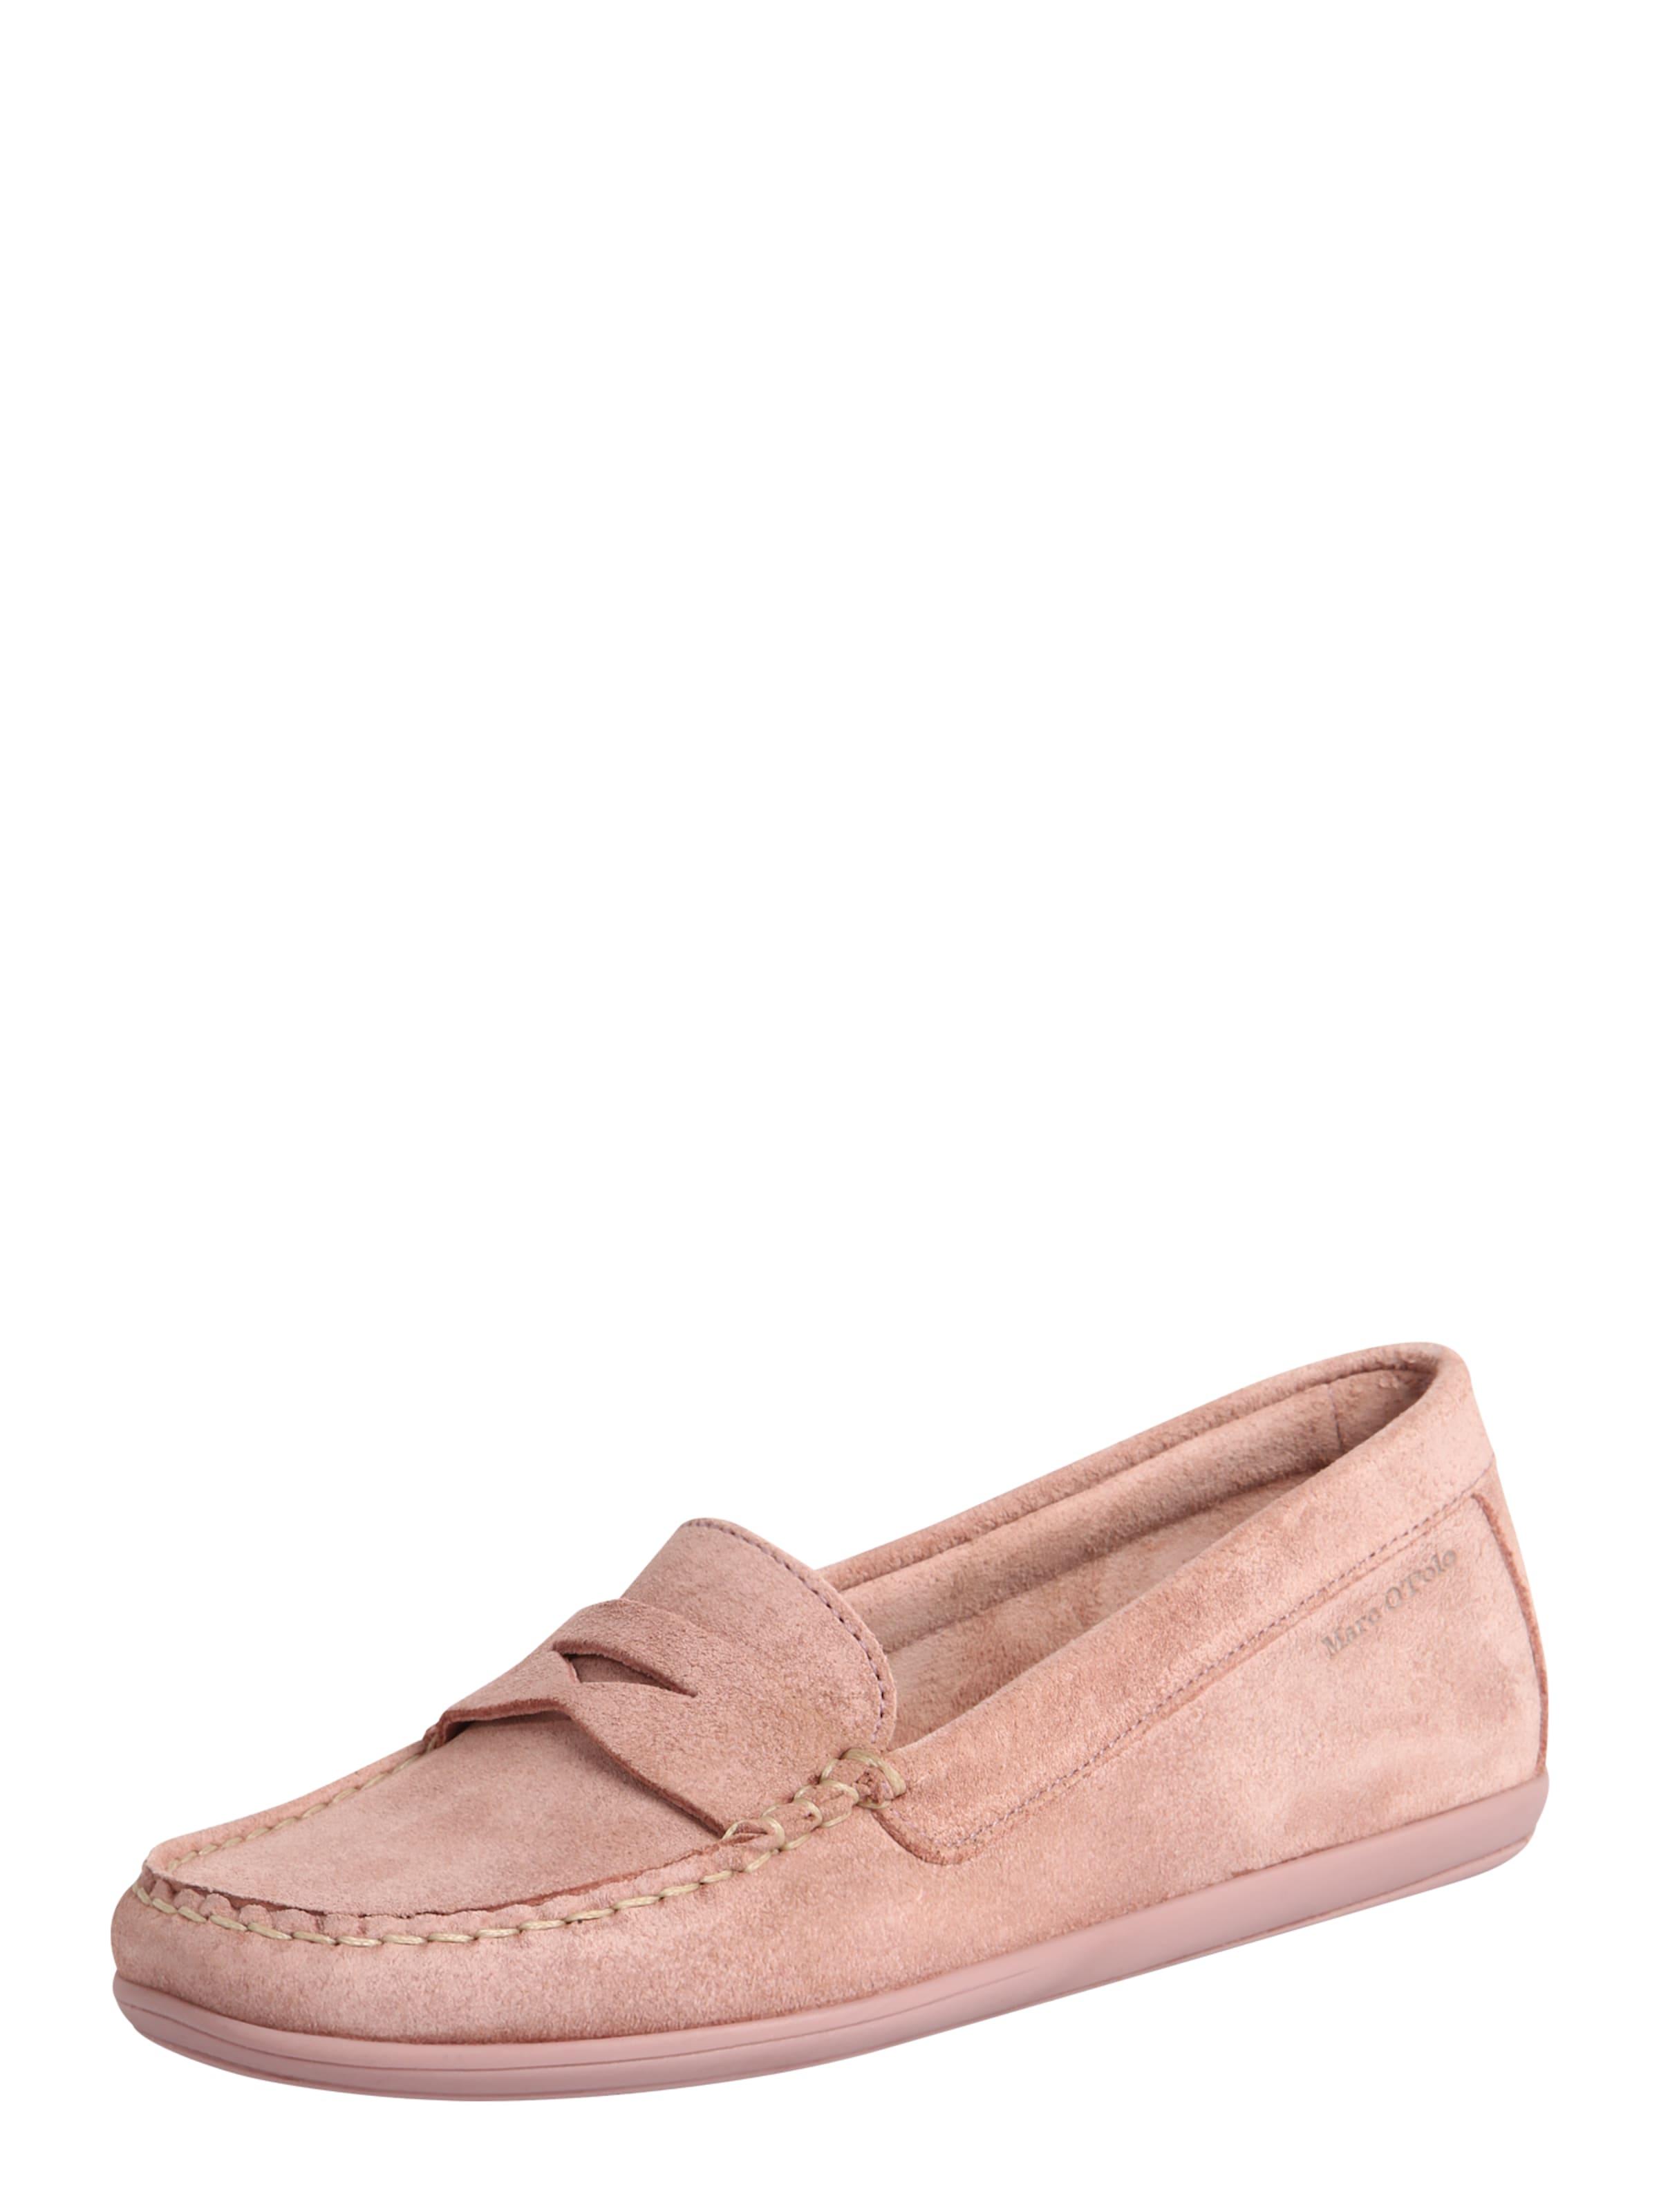 Marc O Polo Mokassin Verschleißfeste billige Schuhe